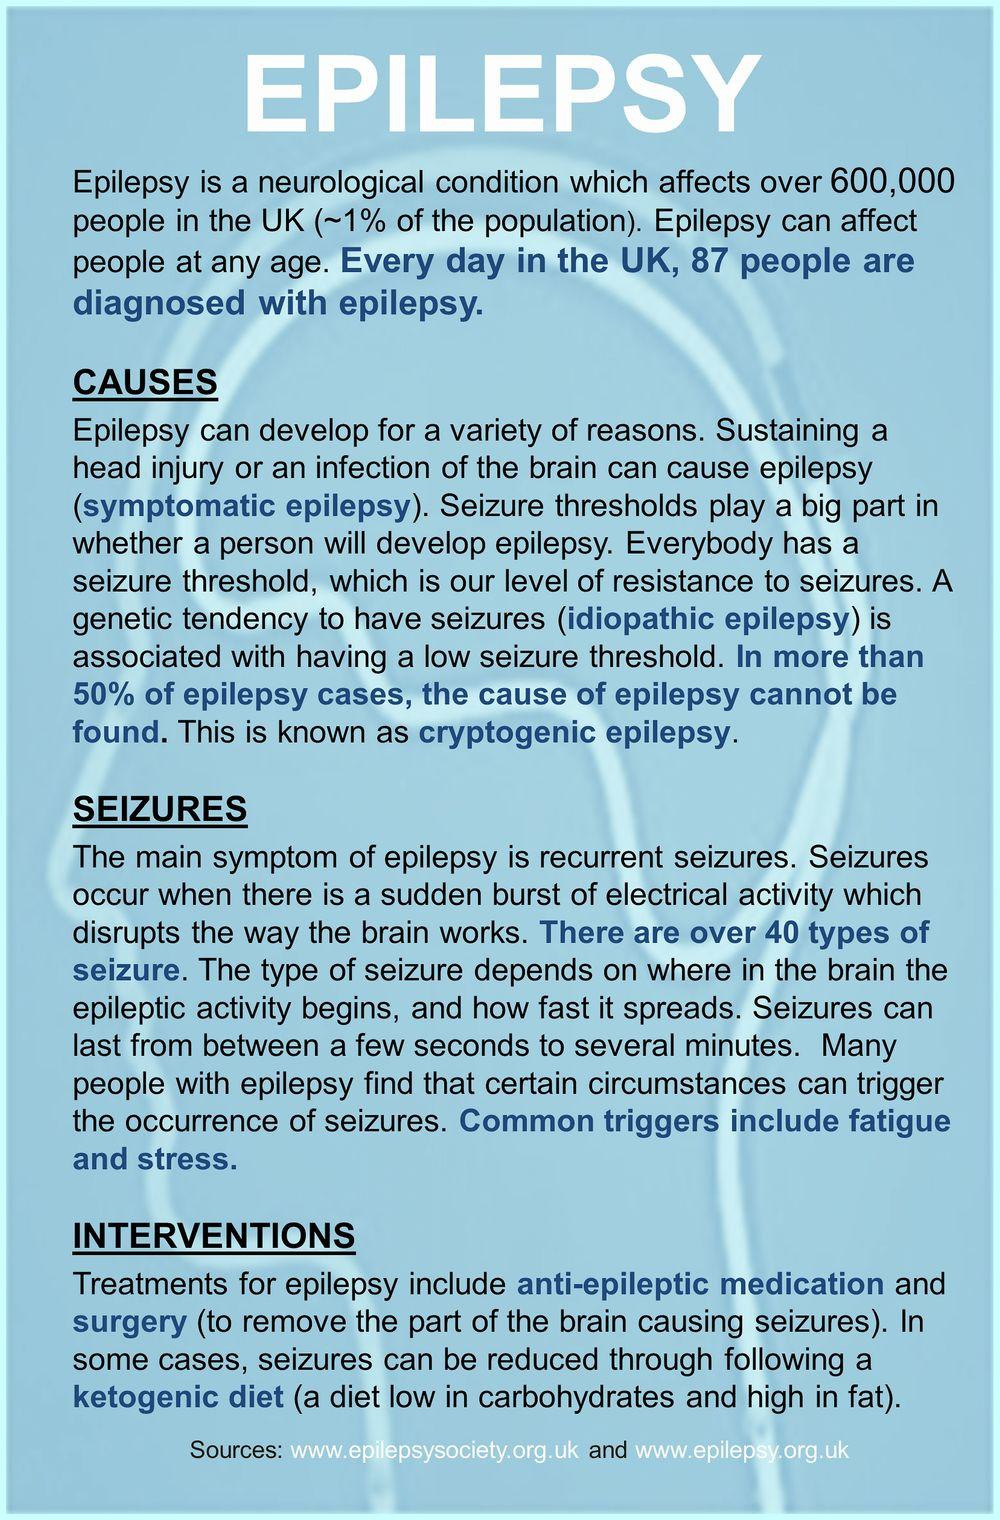 Epilepsy_300dpi_27x42_15mmbleed.jpg